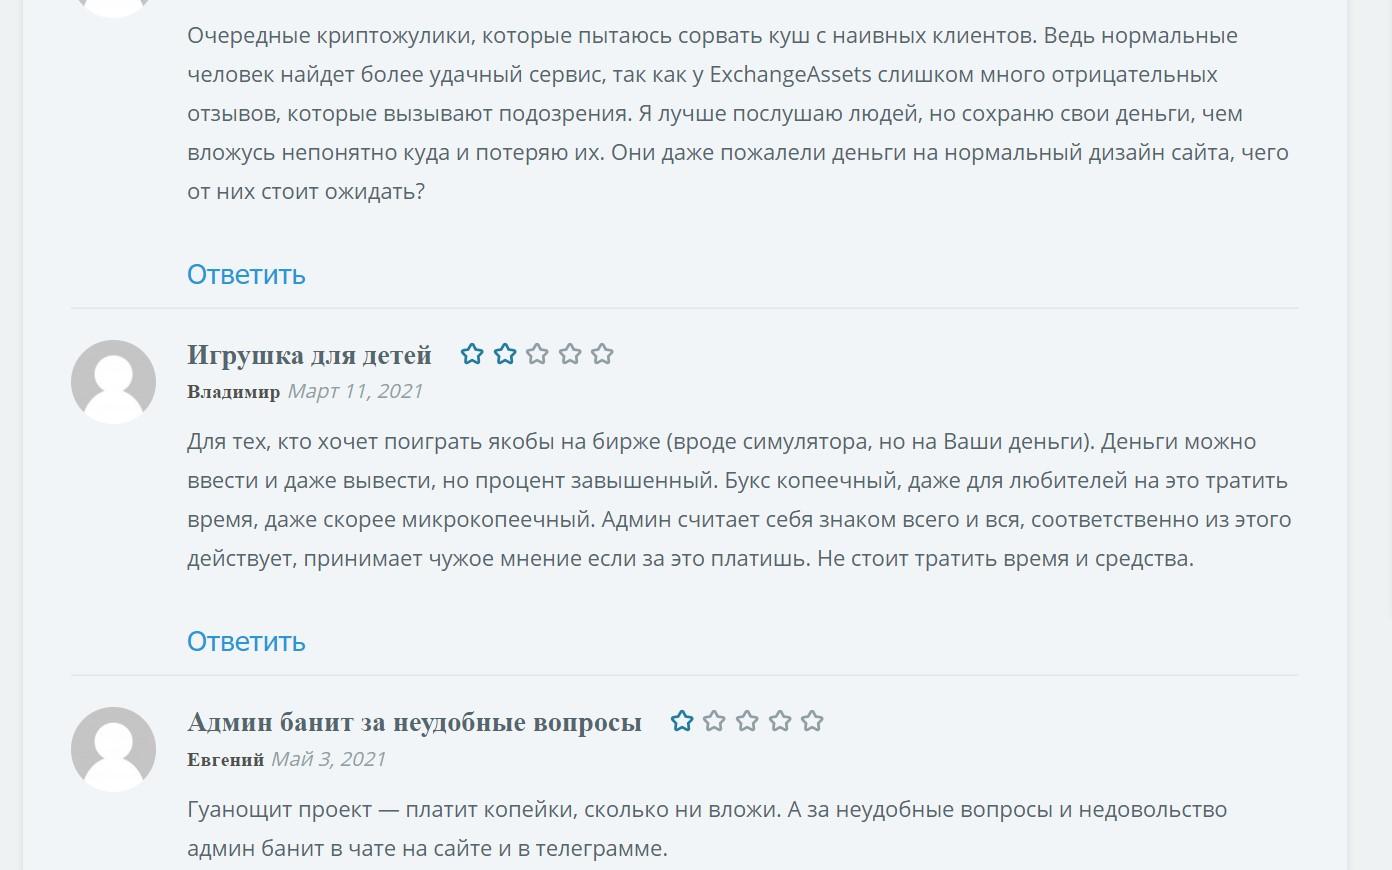 exchange-assets.com отзывы